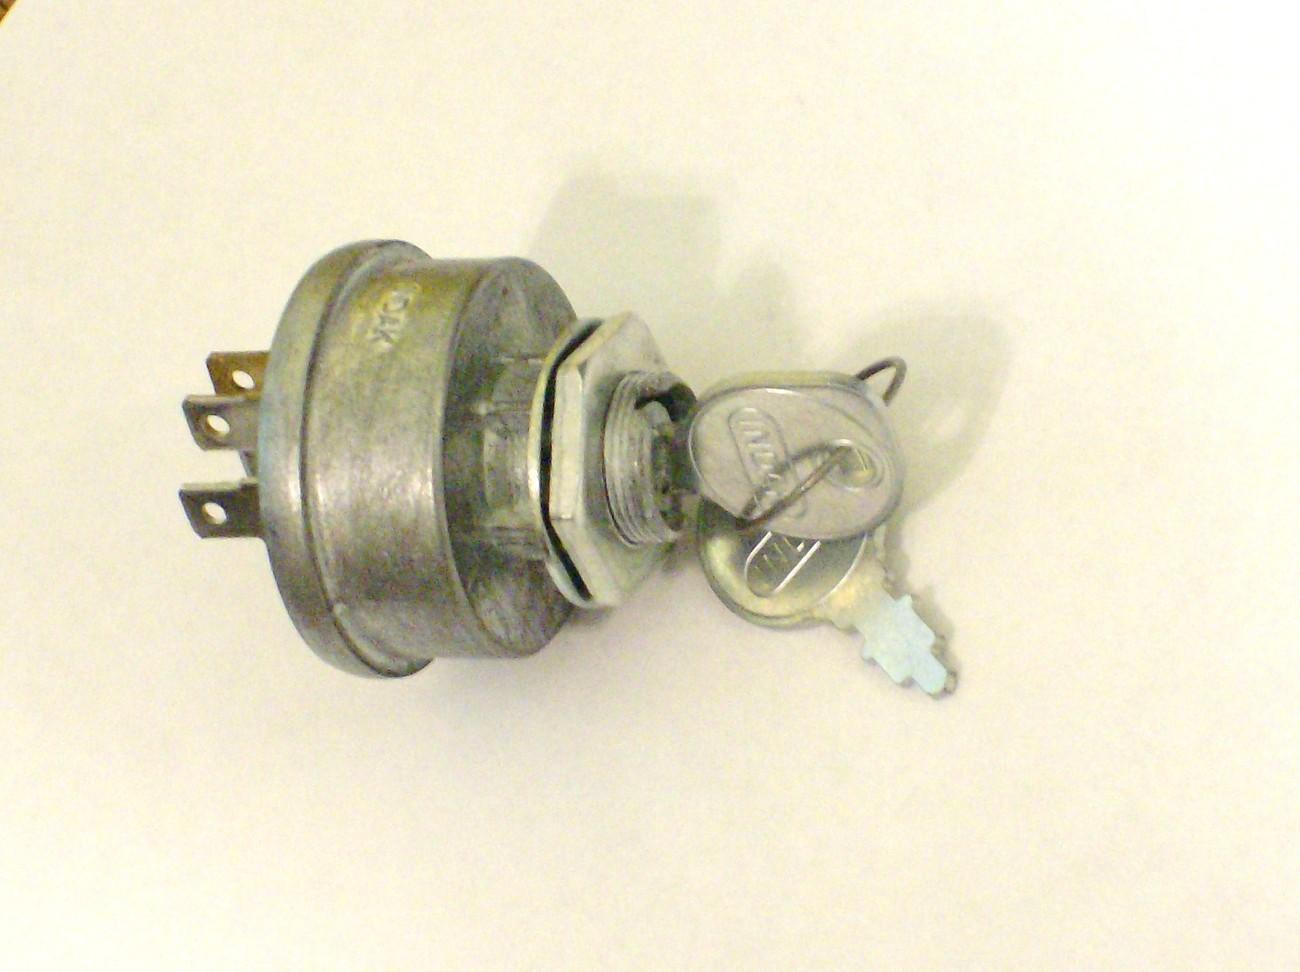 Garden Tractor Ignition Switch : Dixon lawn mower ignition starter switch